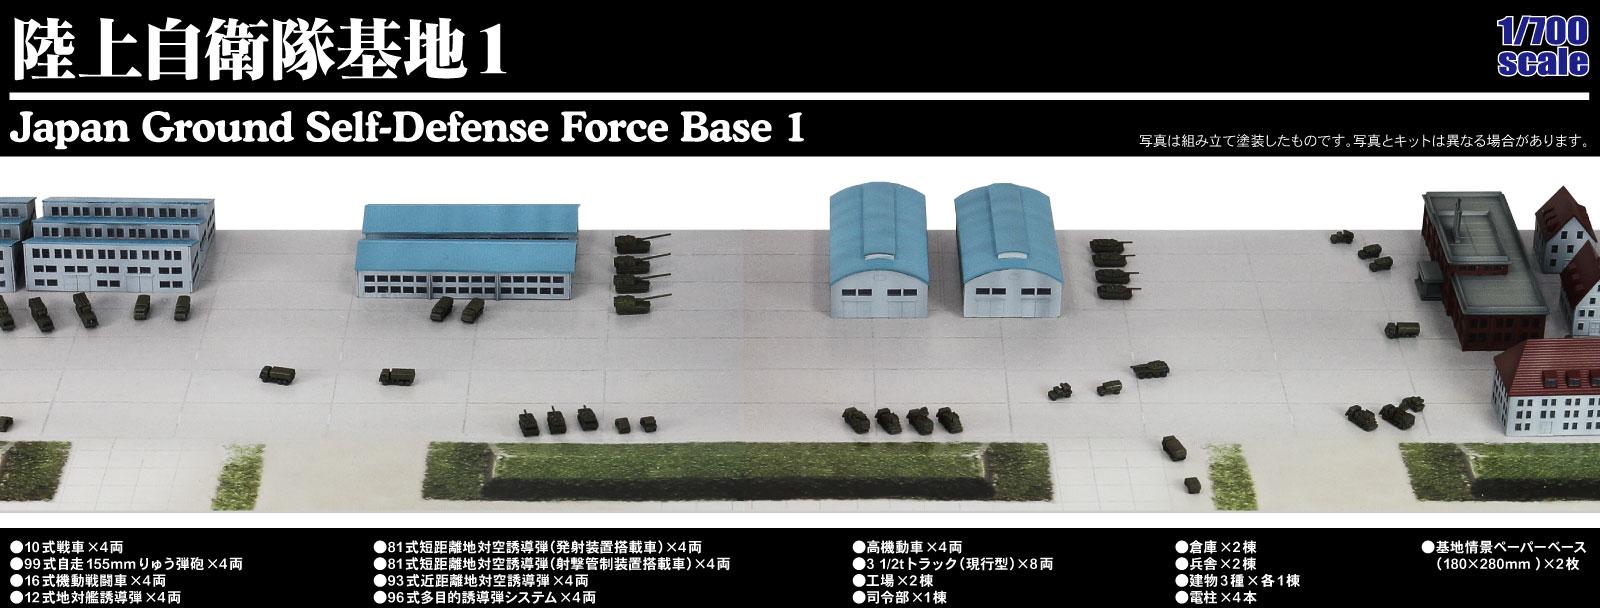 SPS17 1/700 陸上自衛隊基地 1